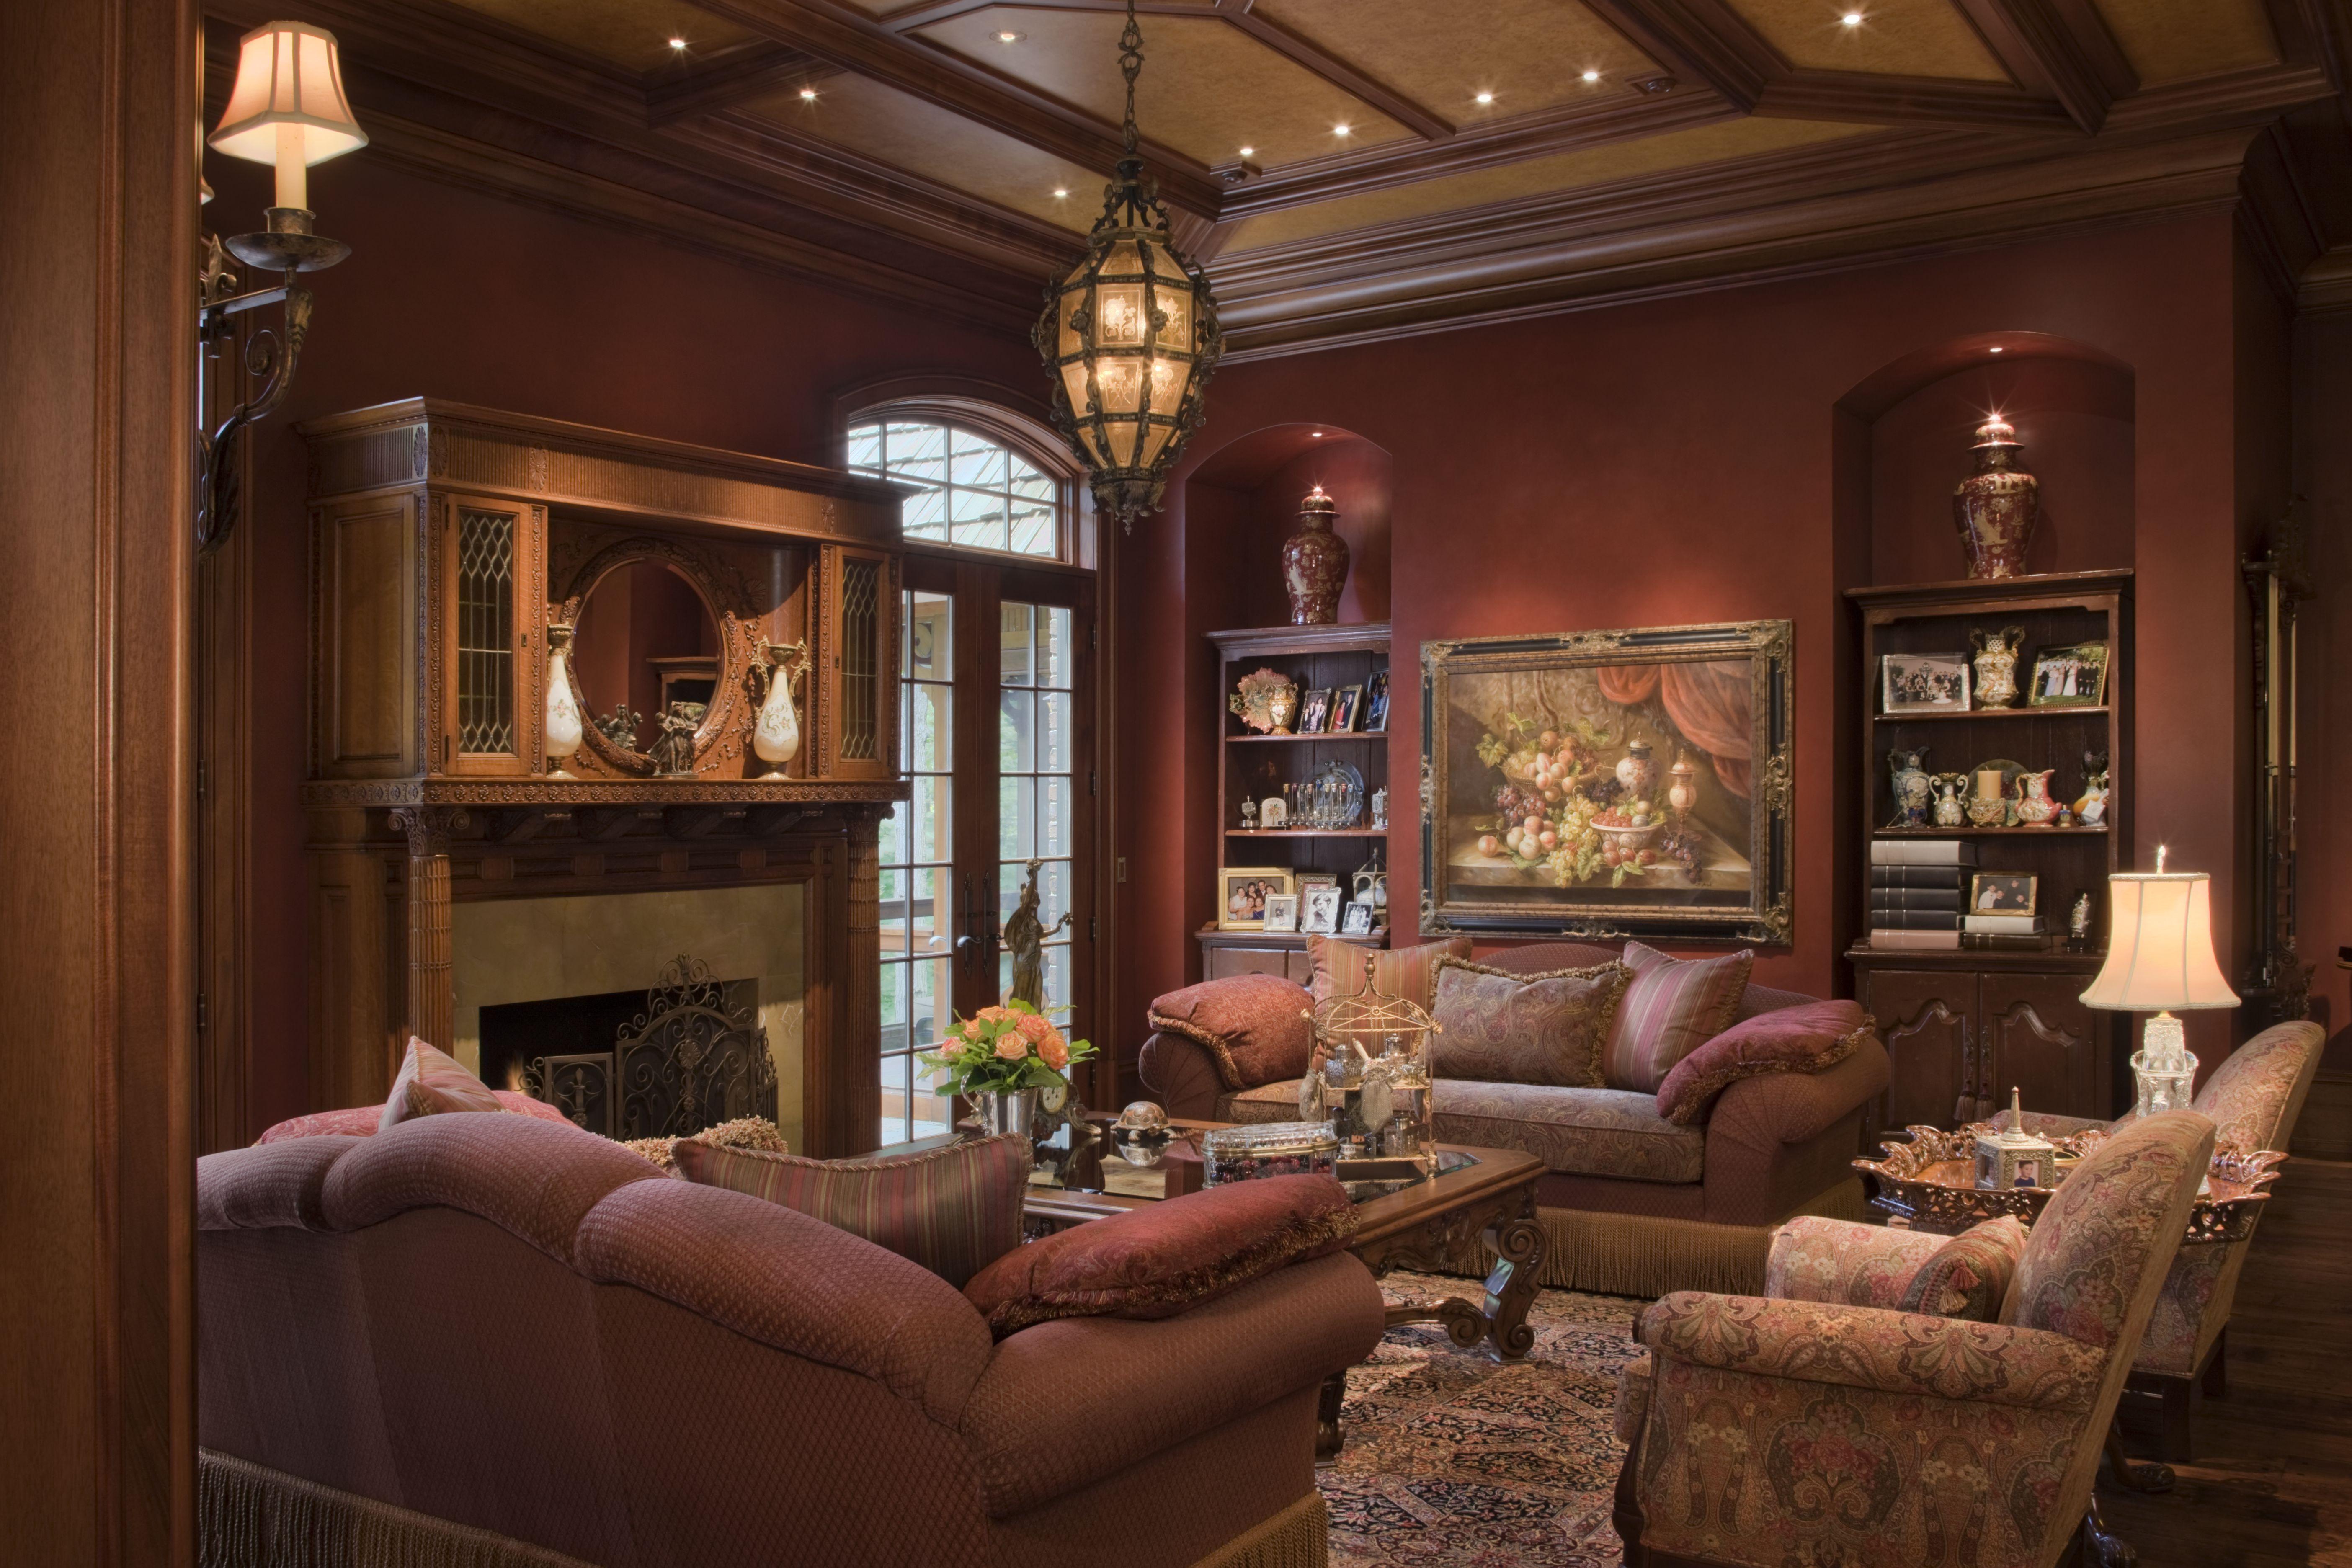 Living Room Traditional Interior Design Ideas teamofsyed2 traditional living room interior design ideas l 03fb5a13941752c9